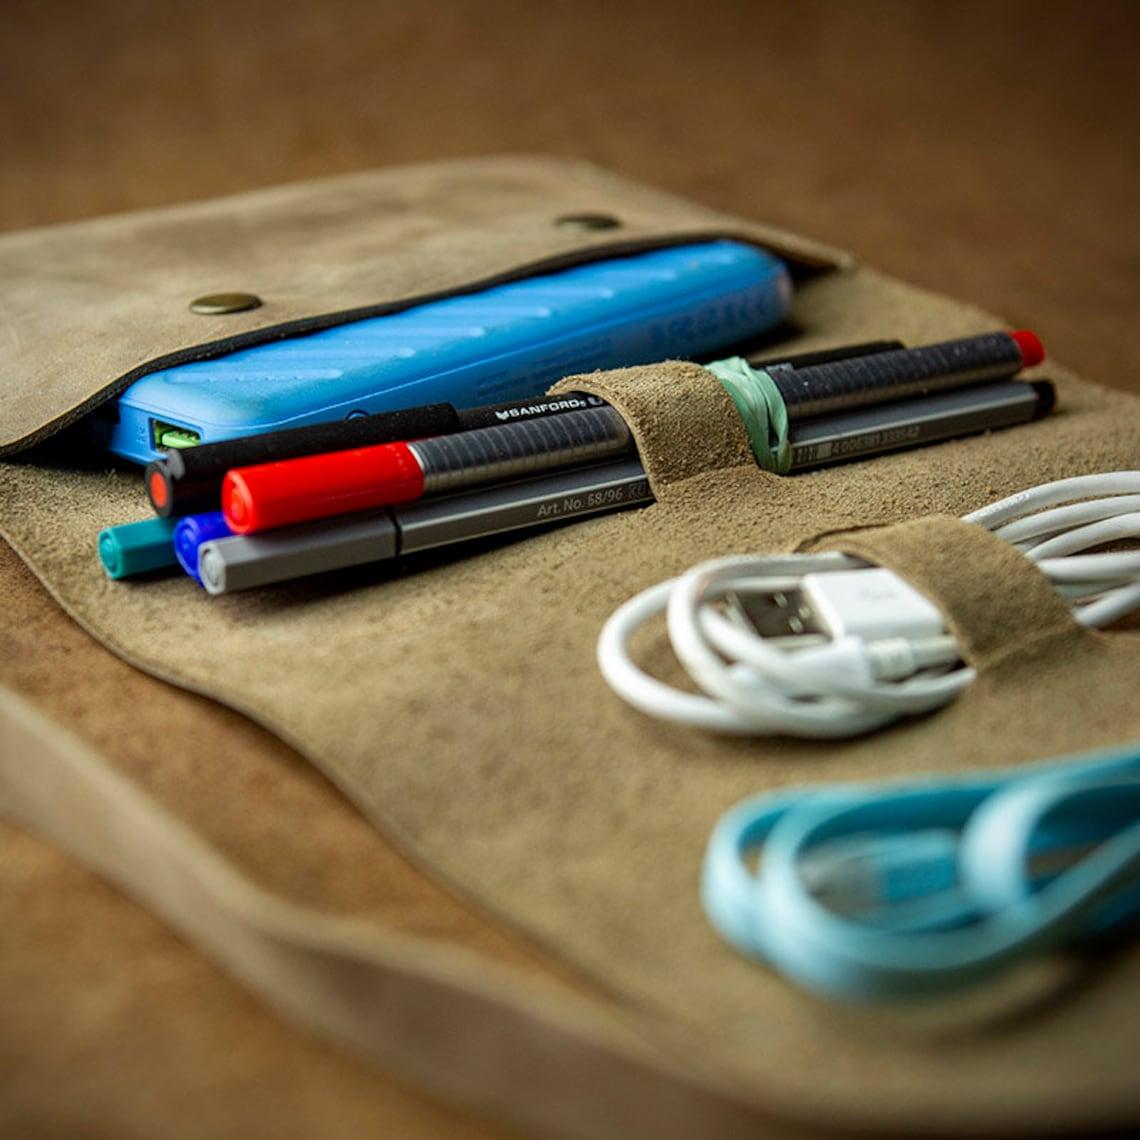 Handmade Leather Travel Organiser (with adjustable slots) - Handmade leather cable organiser